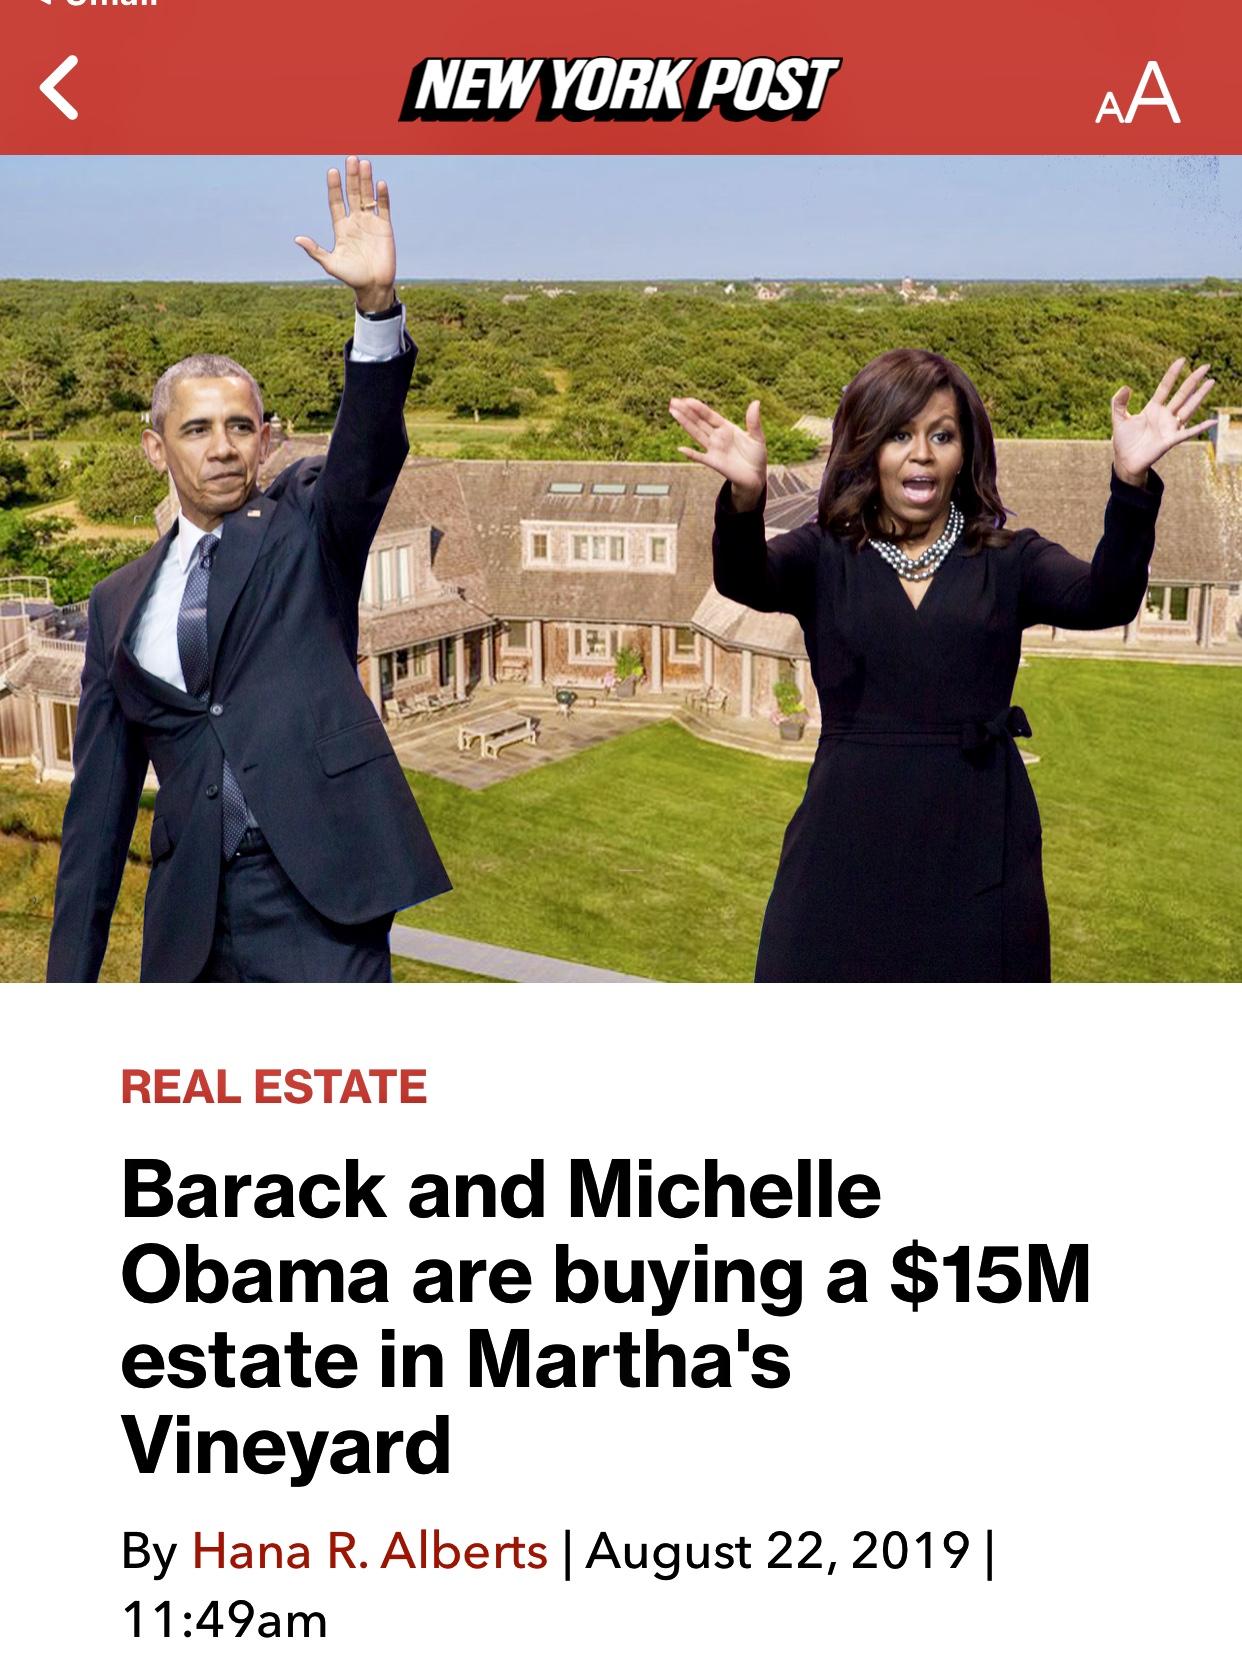 Barack and Michelle Obama buying $14.85M Martha's Vineyard estate